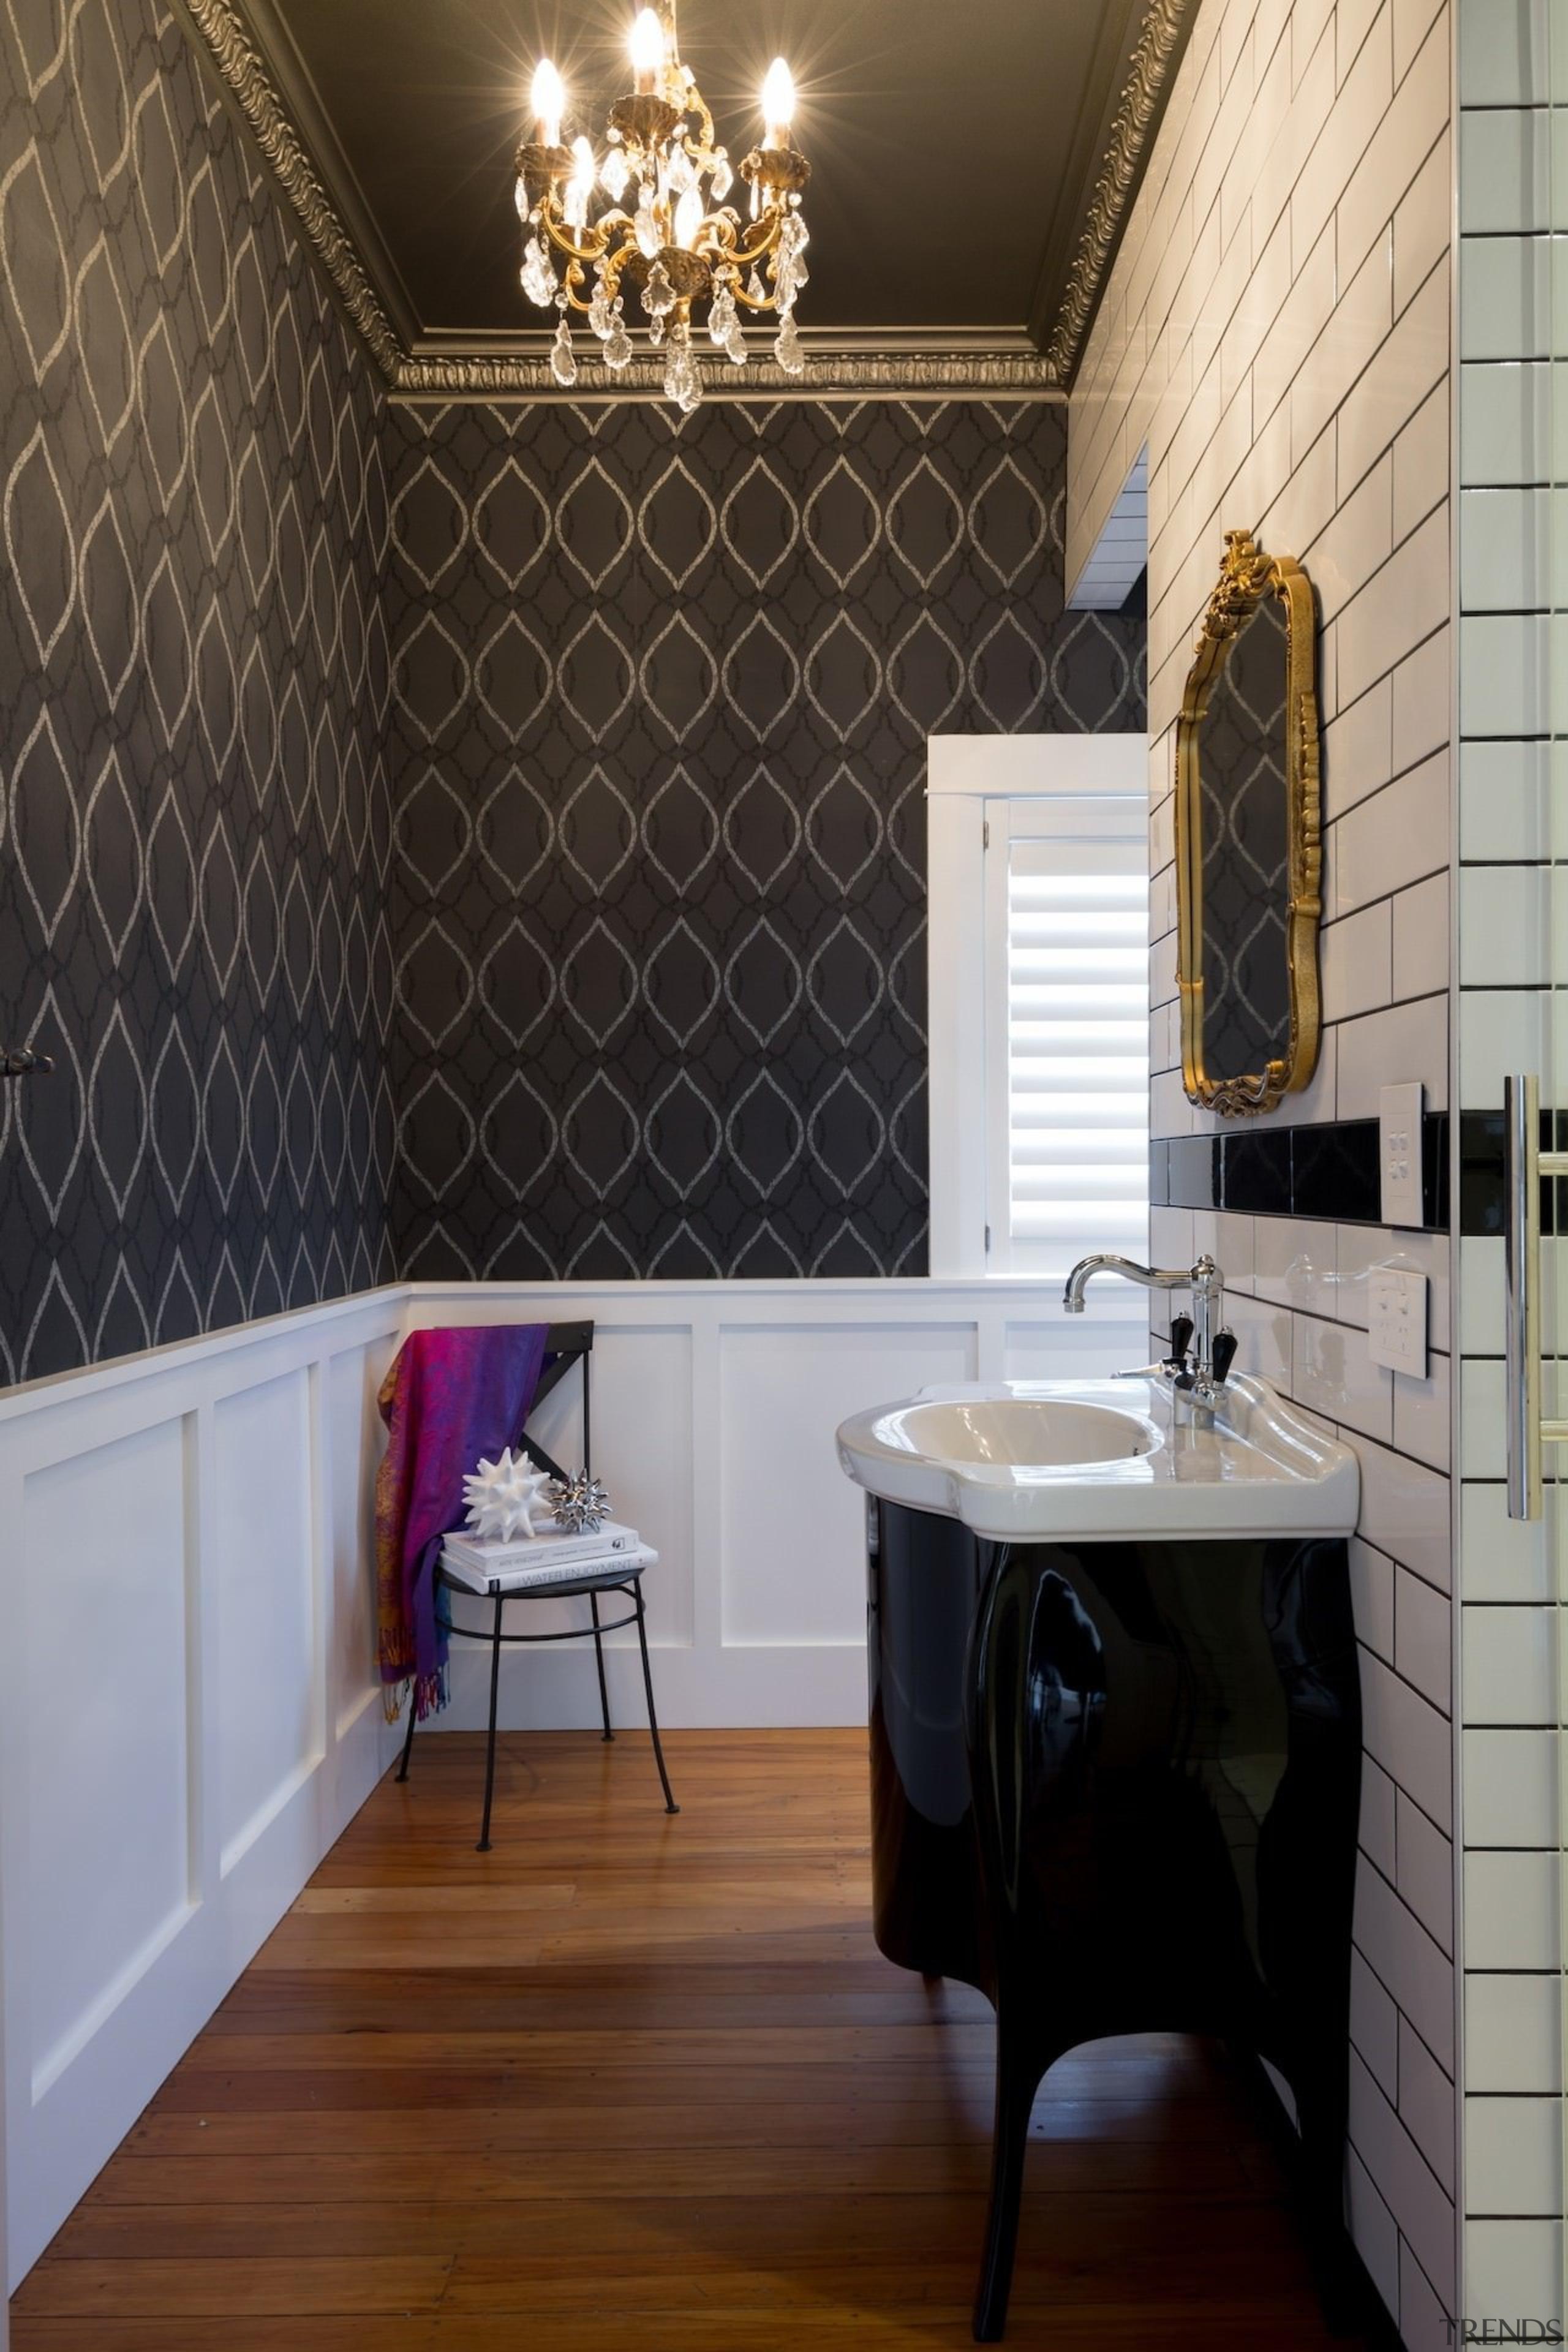 Bespoke Kitchens on Khyber bathroom, ceiling, floor, flooring, home, interior design, laminate flooring, room, tile, wall, wood flooring, black, gray